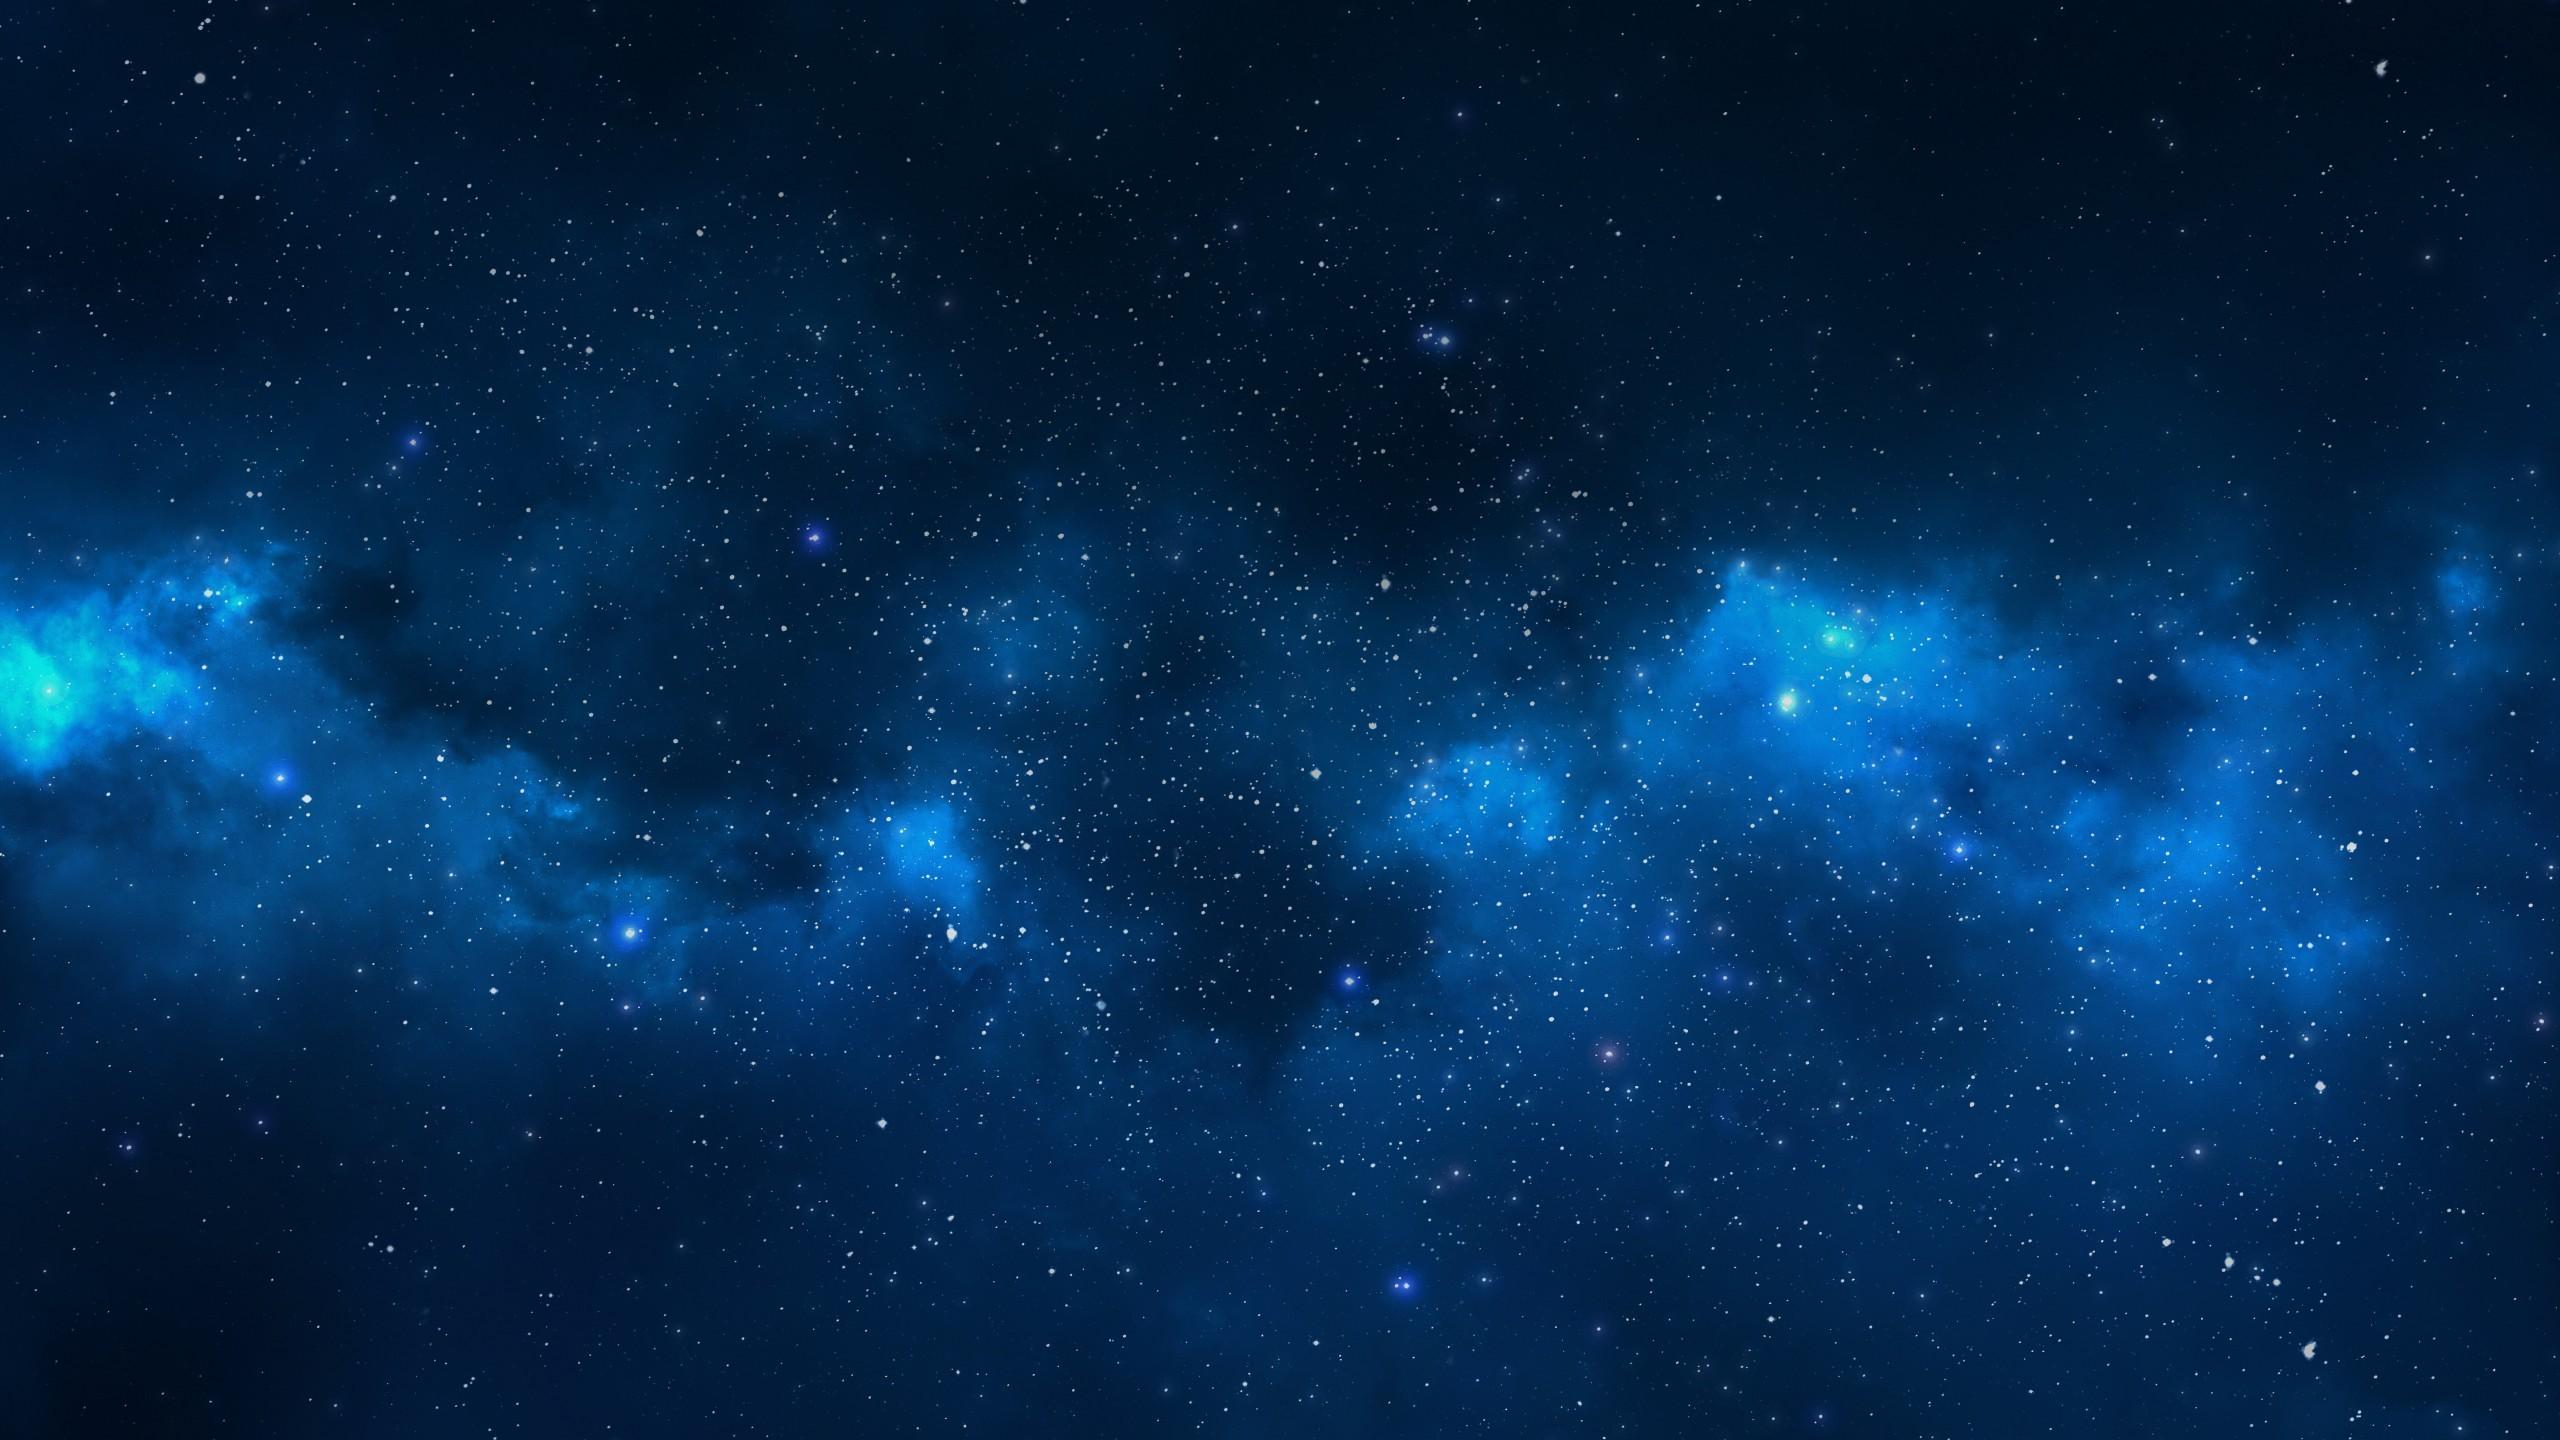 General 2560x1440 artwork simple background blue stars space digital art space art